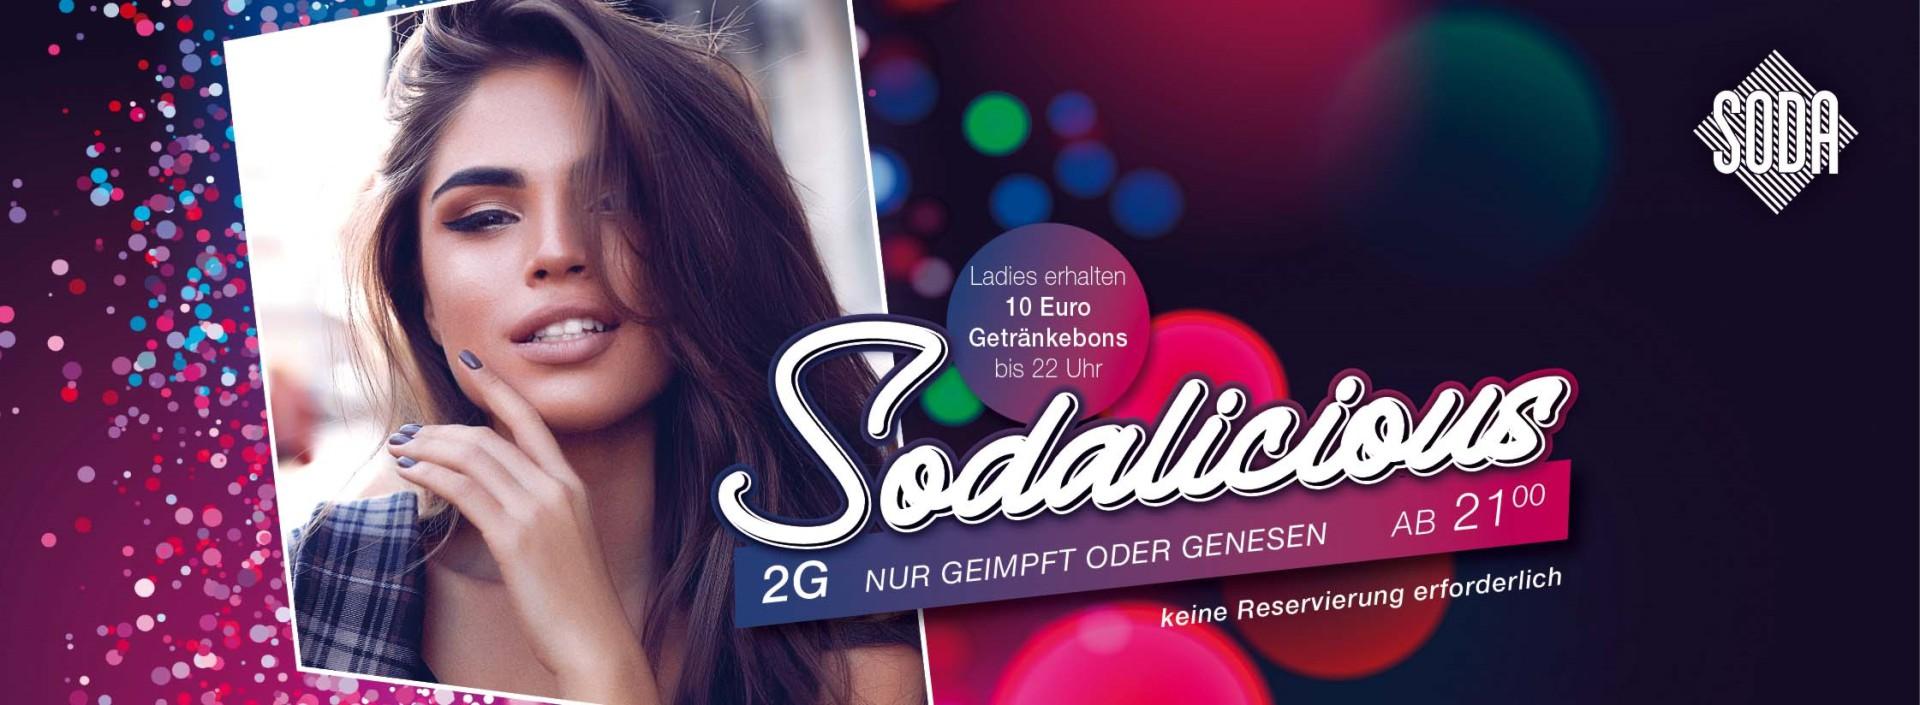 Club, Tanzen, Sodalicious